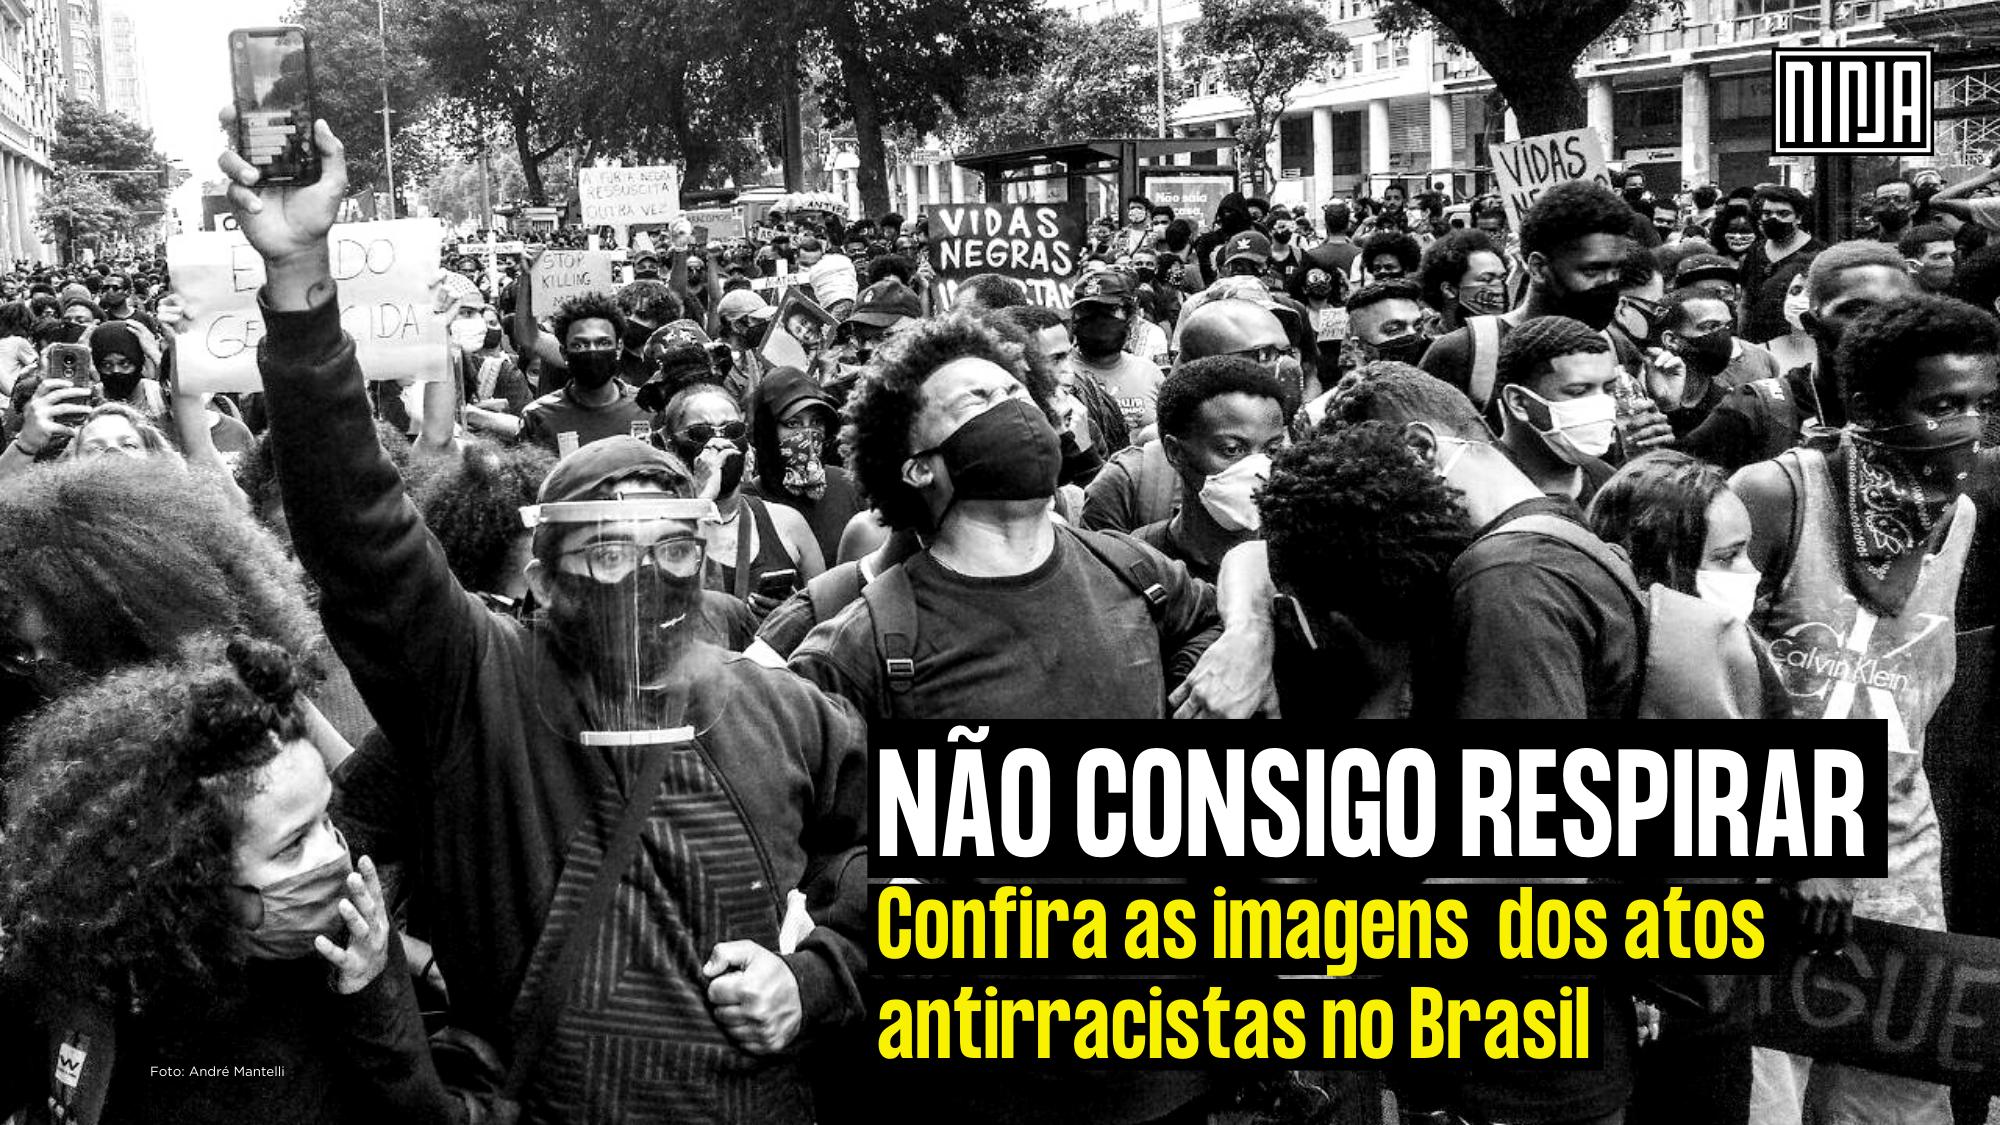 São Paulo (SP) - Foto: Guilherme Gandolfi / Mídia NINJA